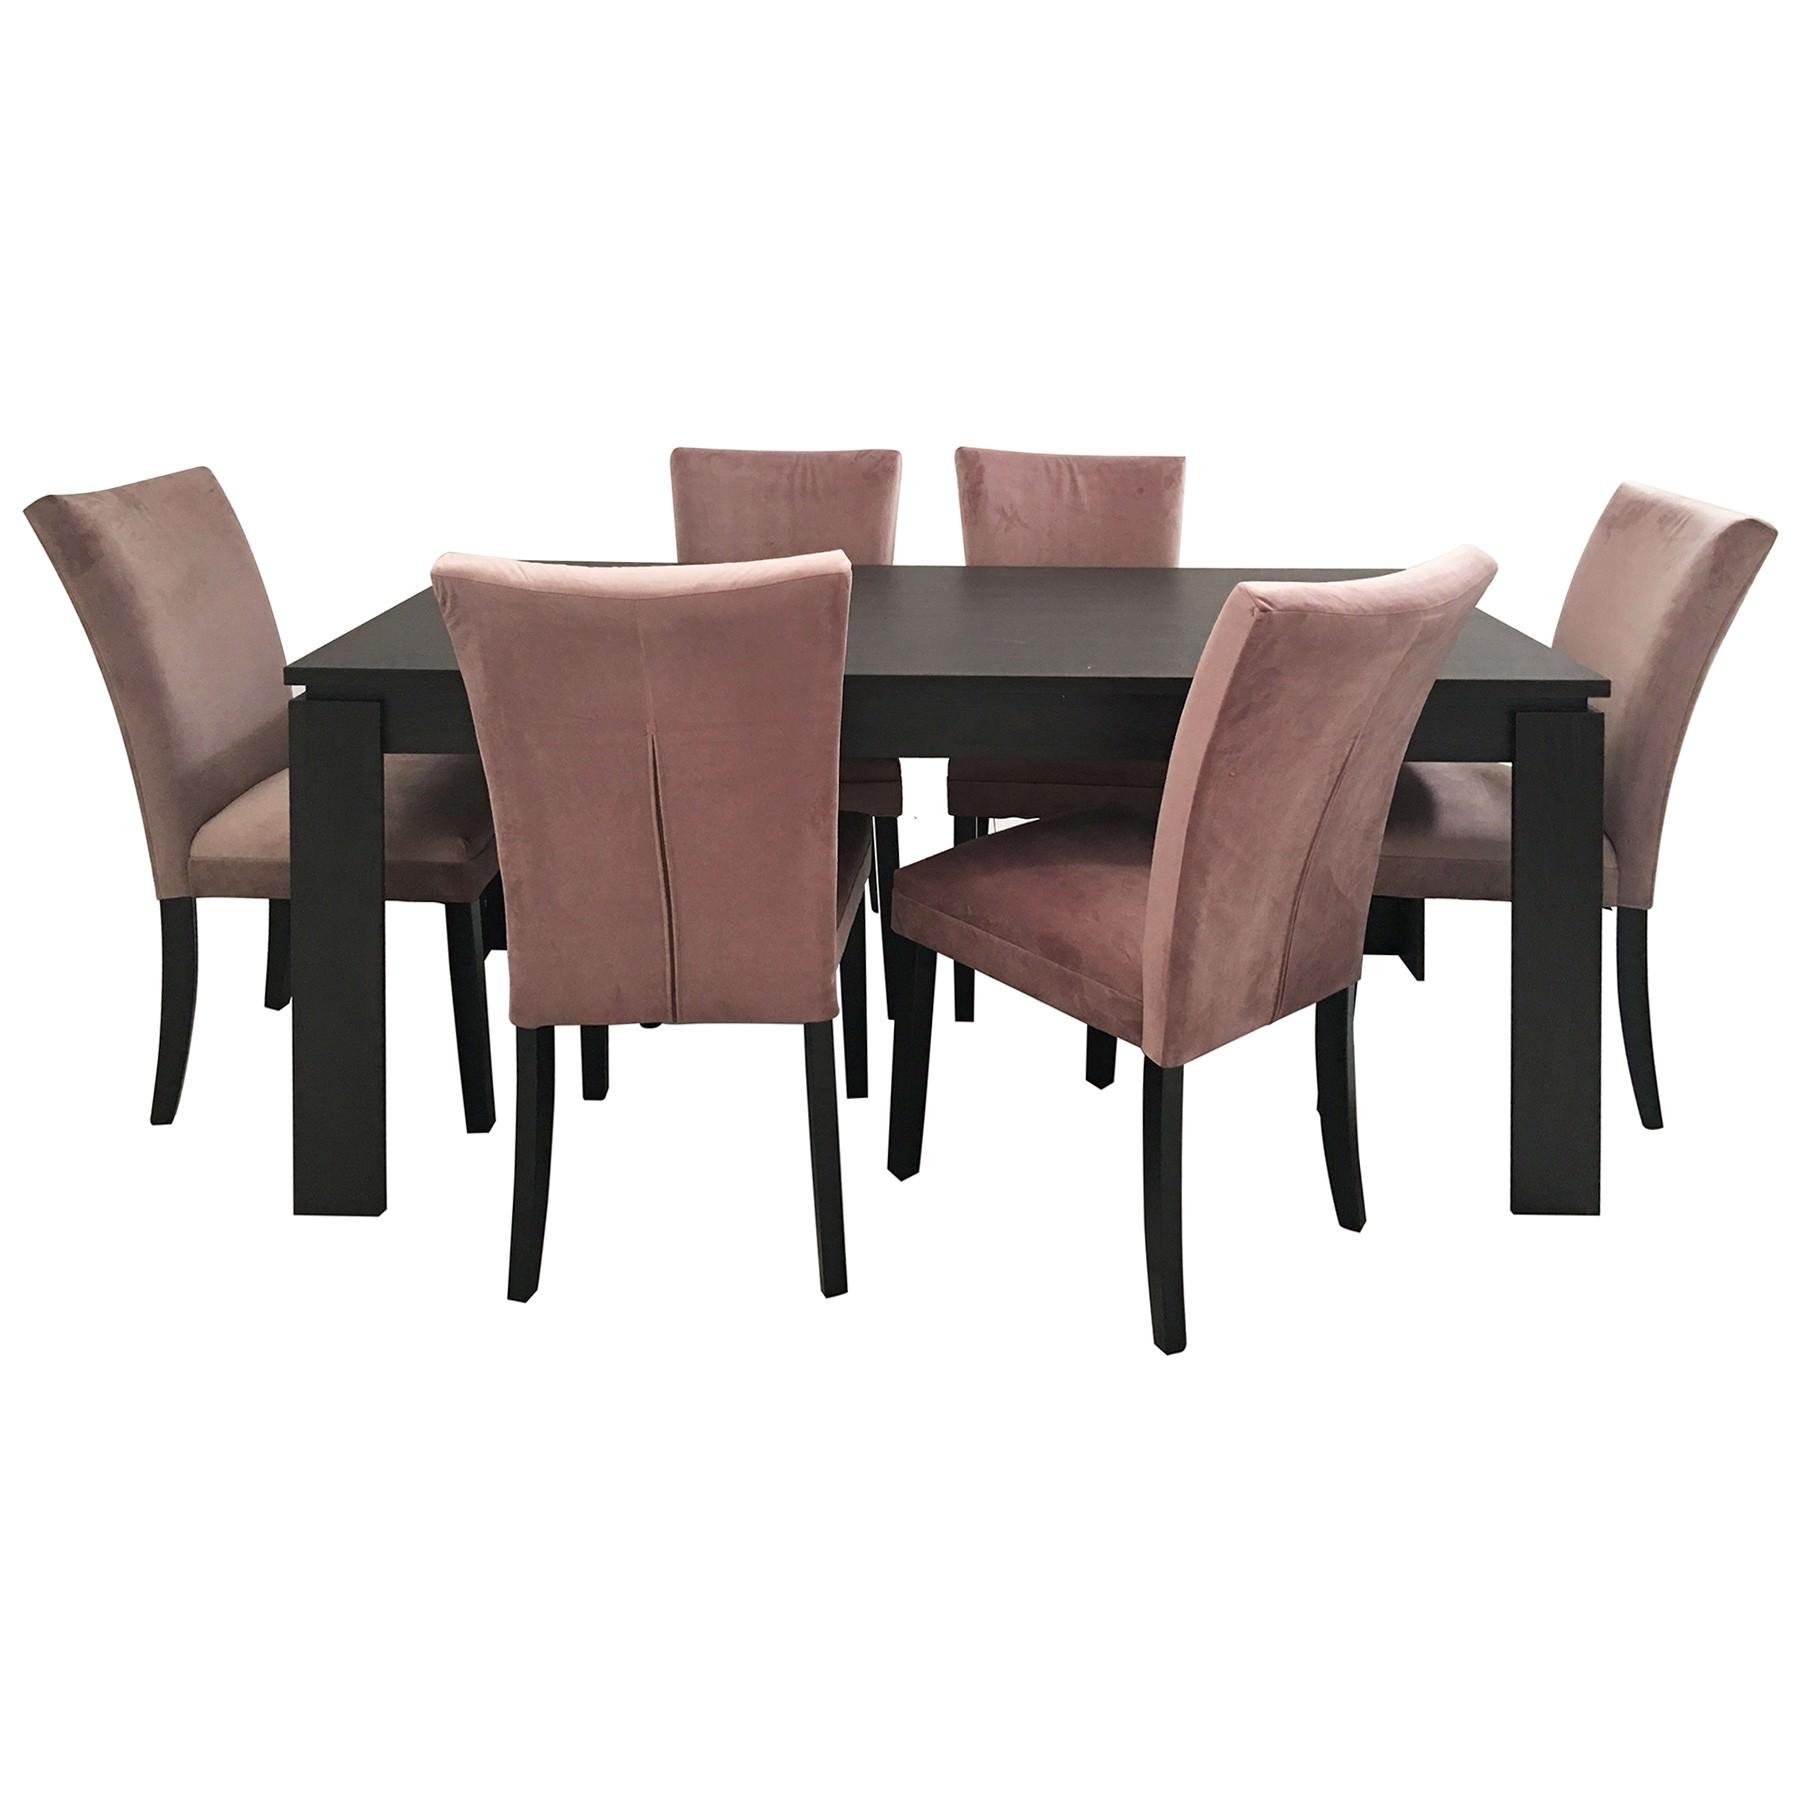 Carra 7 Piece Dining Table Set, 180cm